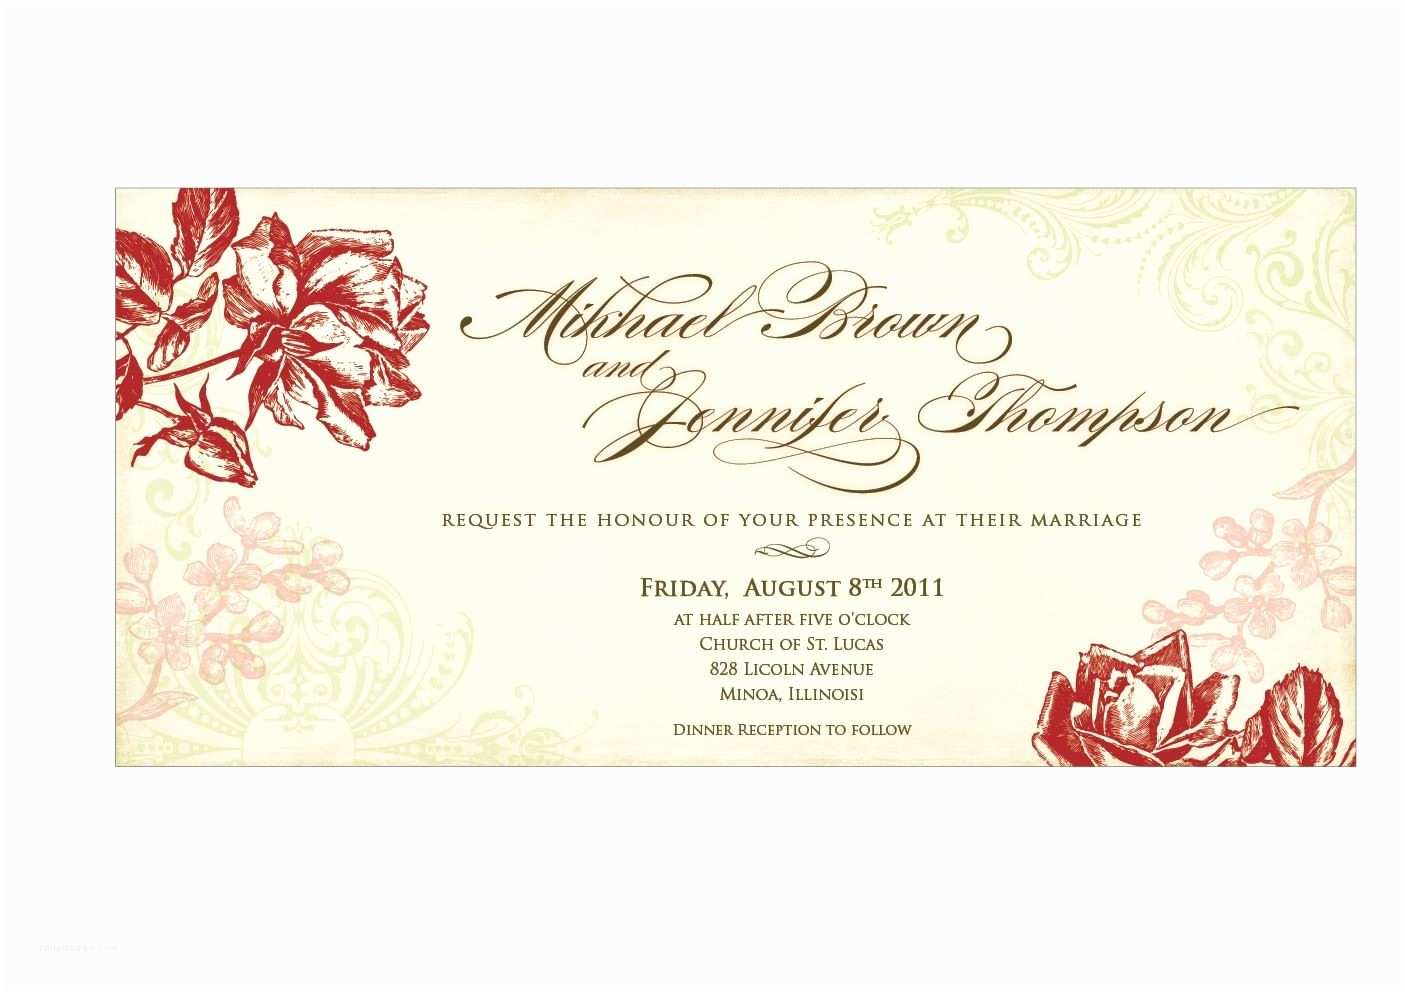 Wedding Invitation Design Images Wedding Invitations Designs Samples Marriage Invitation